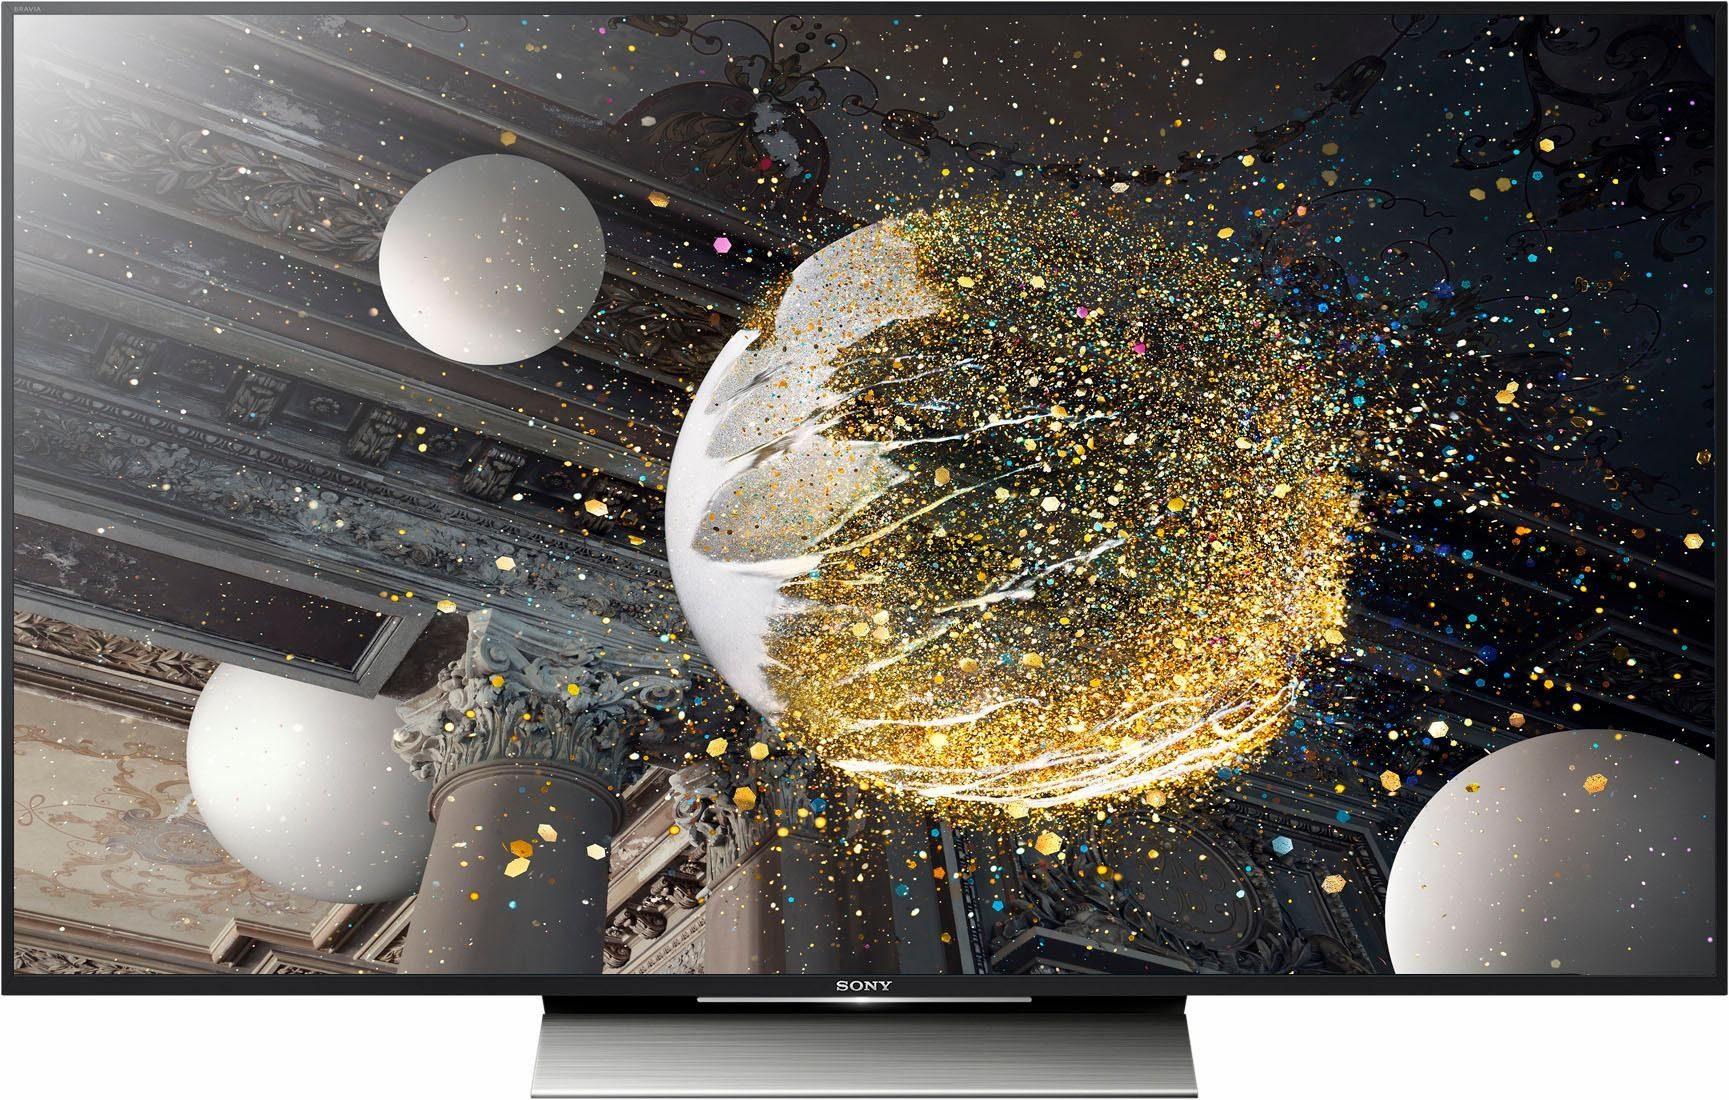 Sony KD-55XD8005, LED Fernseher, 139 cm (55 Zoll), 2160p (4K Ultra HD), HDR, Smart-TV